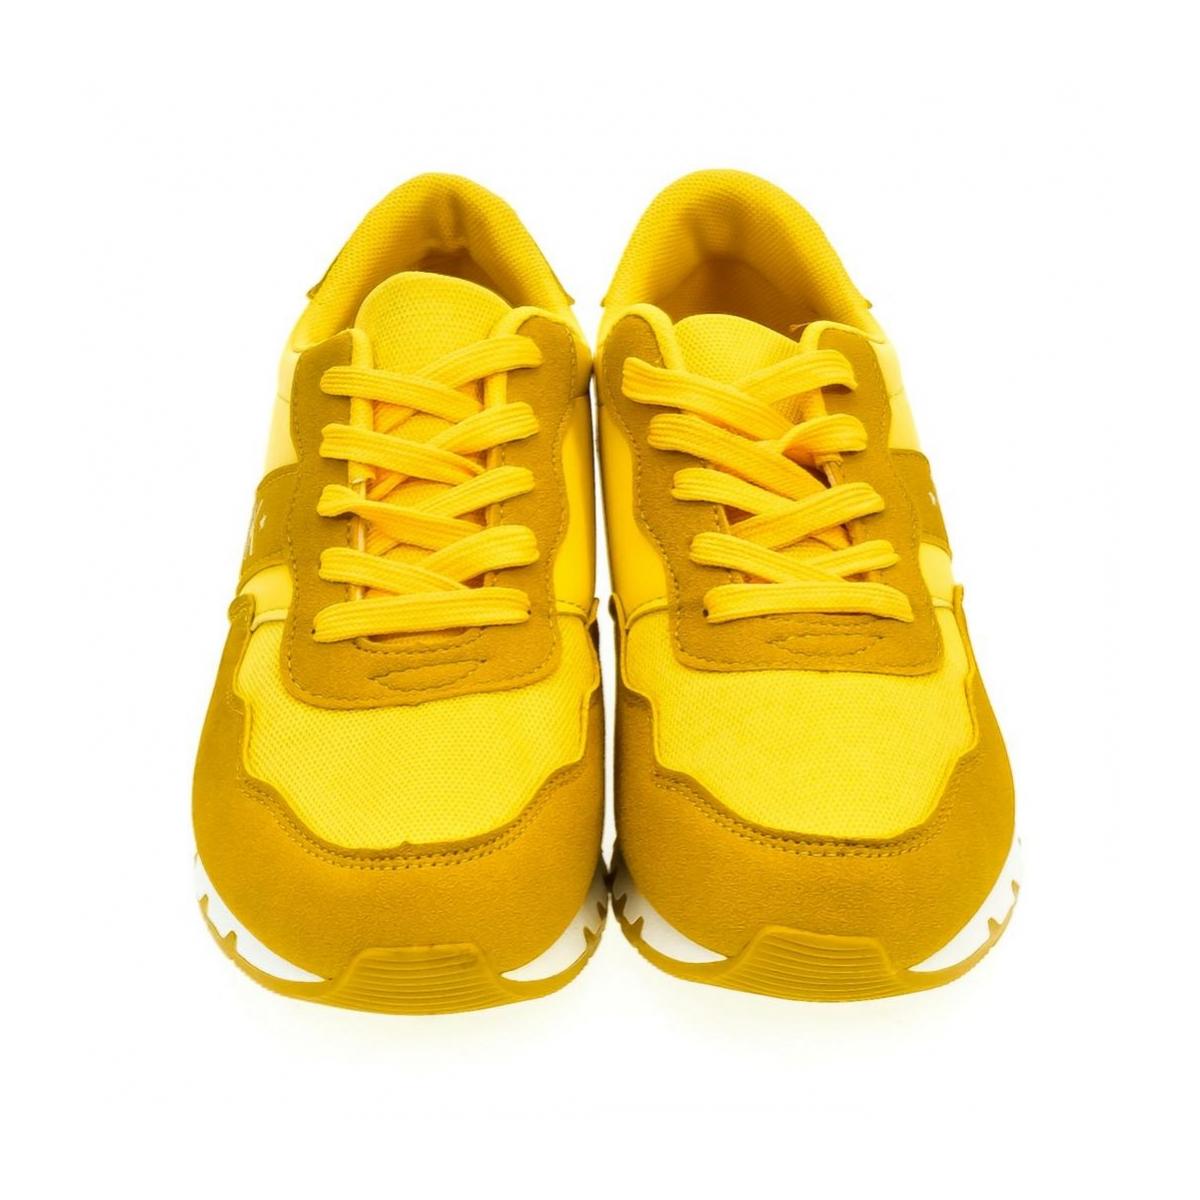 b5fc0c5f8c Dámske žlté tenisky MARI - 2